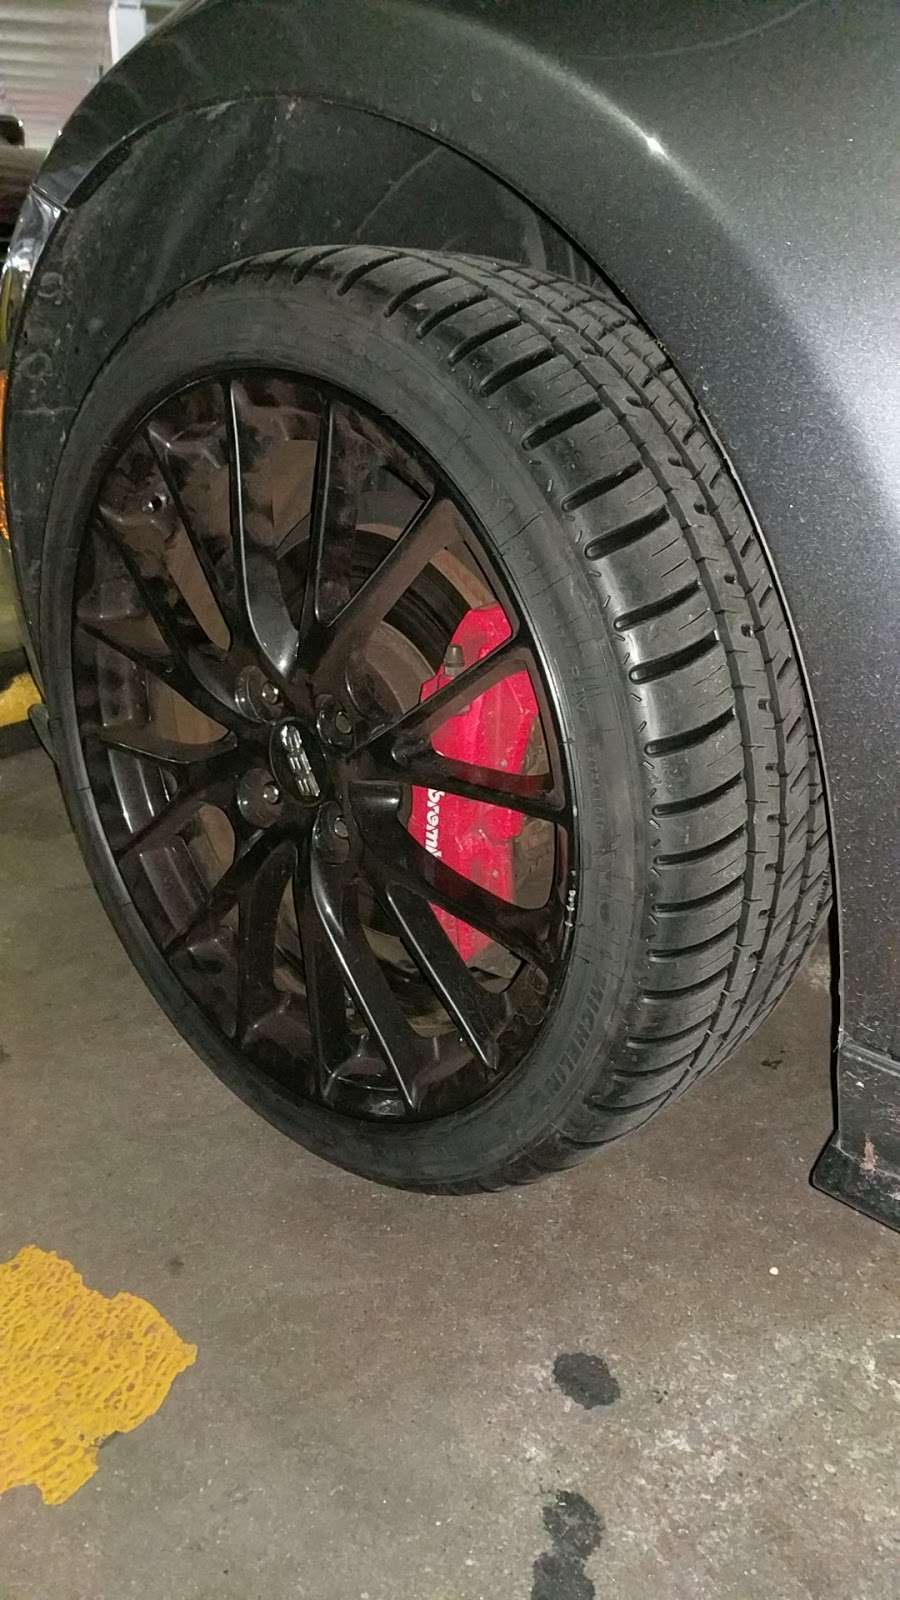 Mobile Tire Shop - car repair    Photo 5 of 10   Address: 654 Utica Ave, Brooklyn, NY 11203, USA   Phone: (347) 673-6962